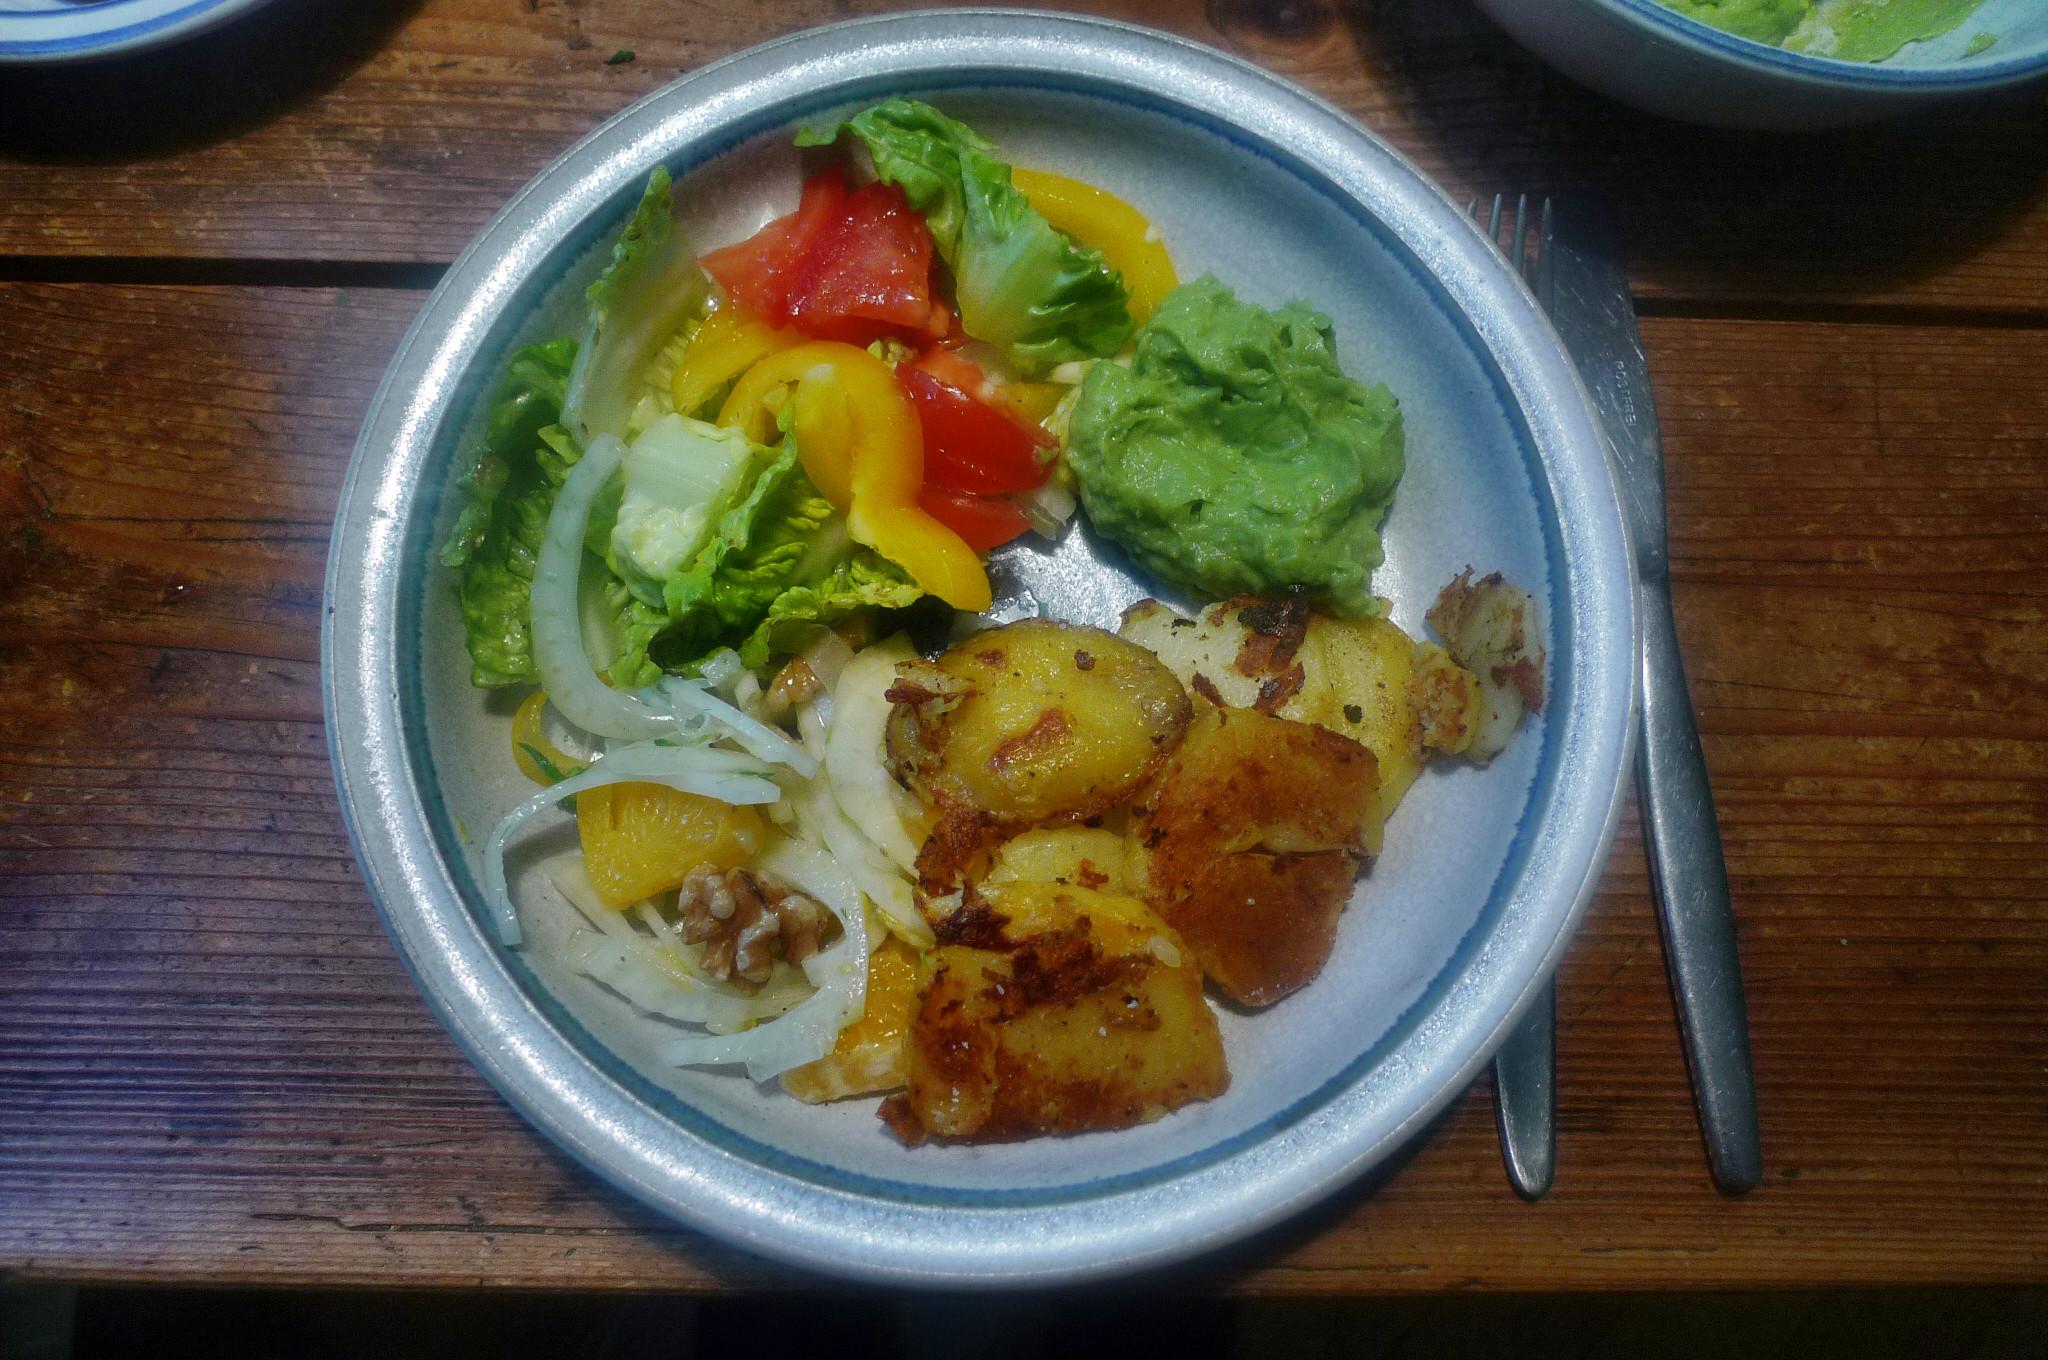 Guacamole,Fenchelsalat,Salat,Bratkartoffel--22.1.15   (1)